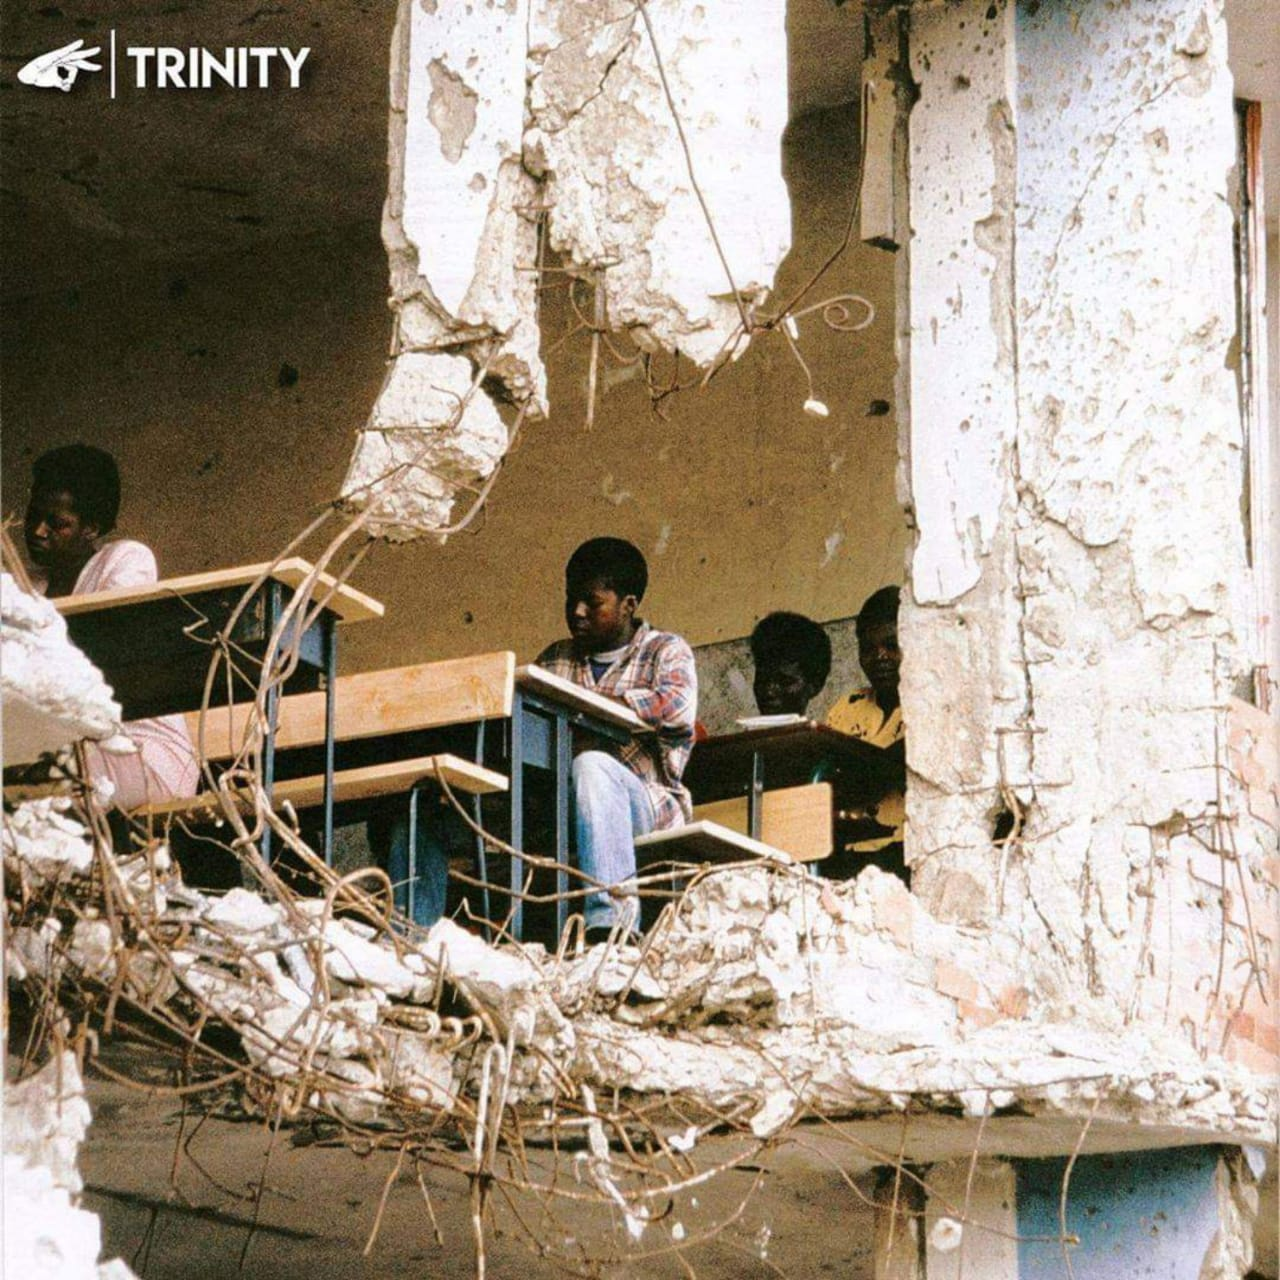 Trinity 3nity - Malembe